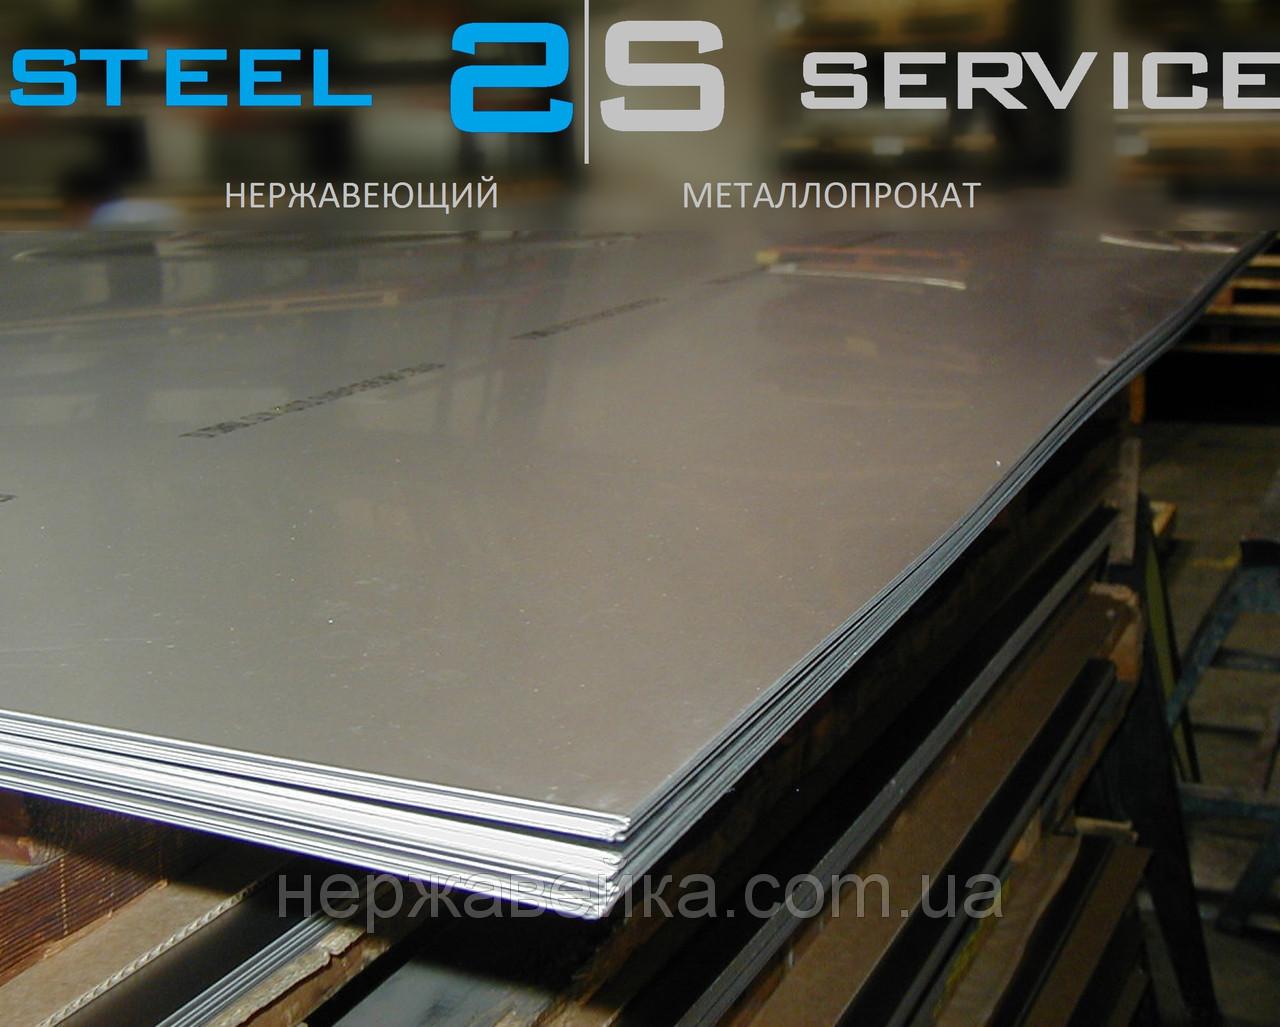 Нержавеющий лист 0,8х1000х2000мм AISI 430(12Х17) 4N - шлифованный, технический